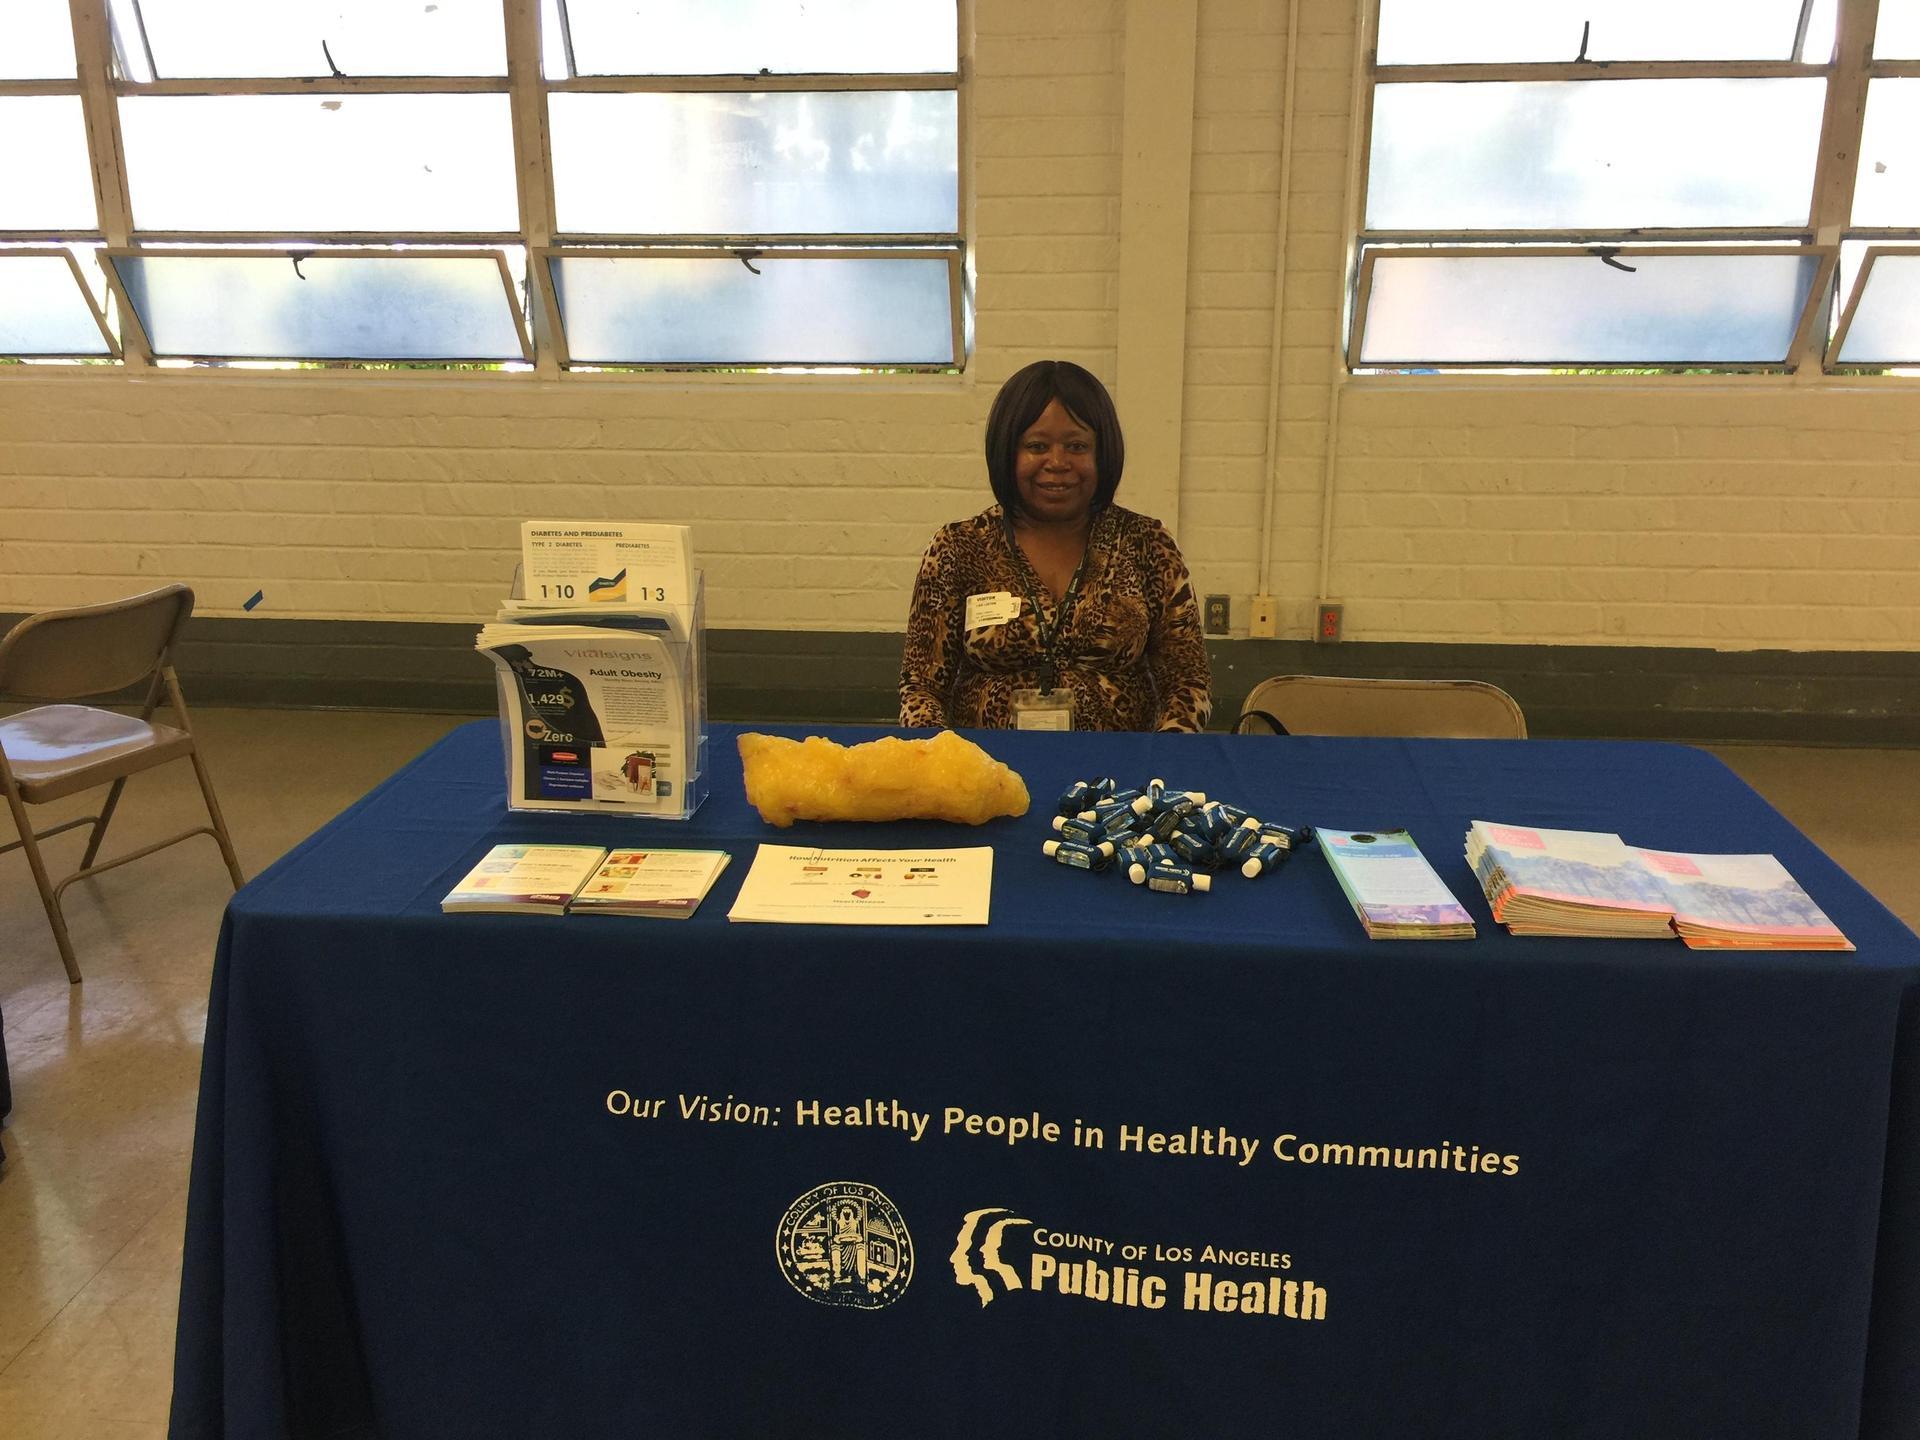 Health and Benefits Fair